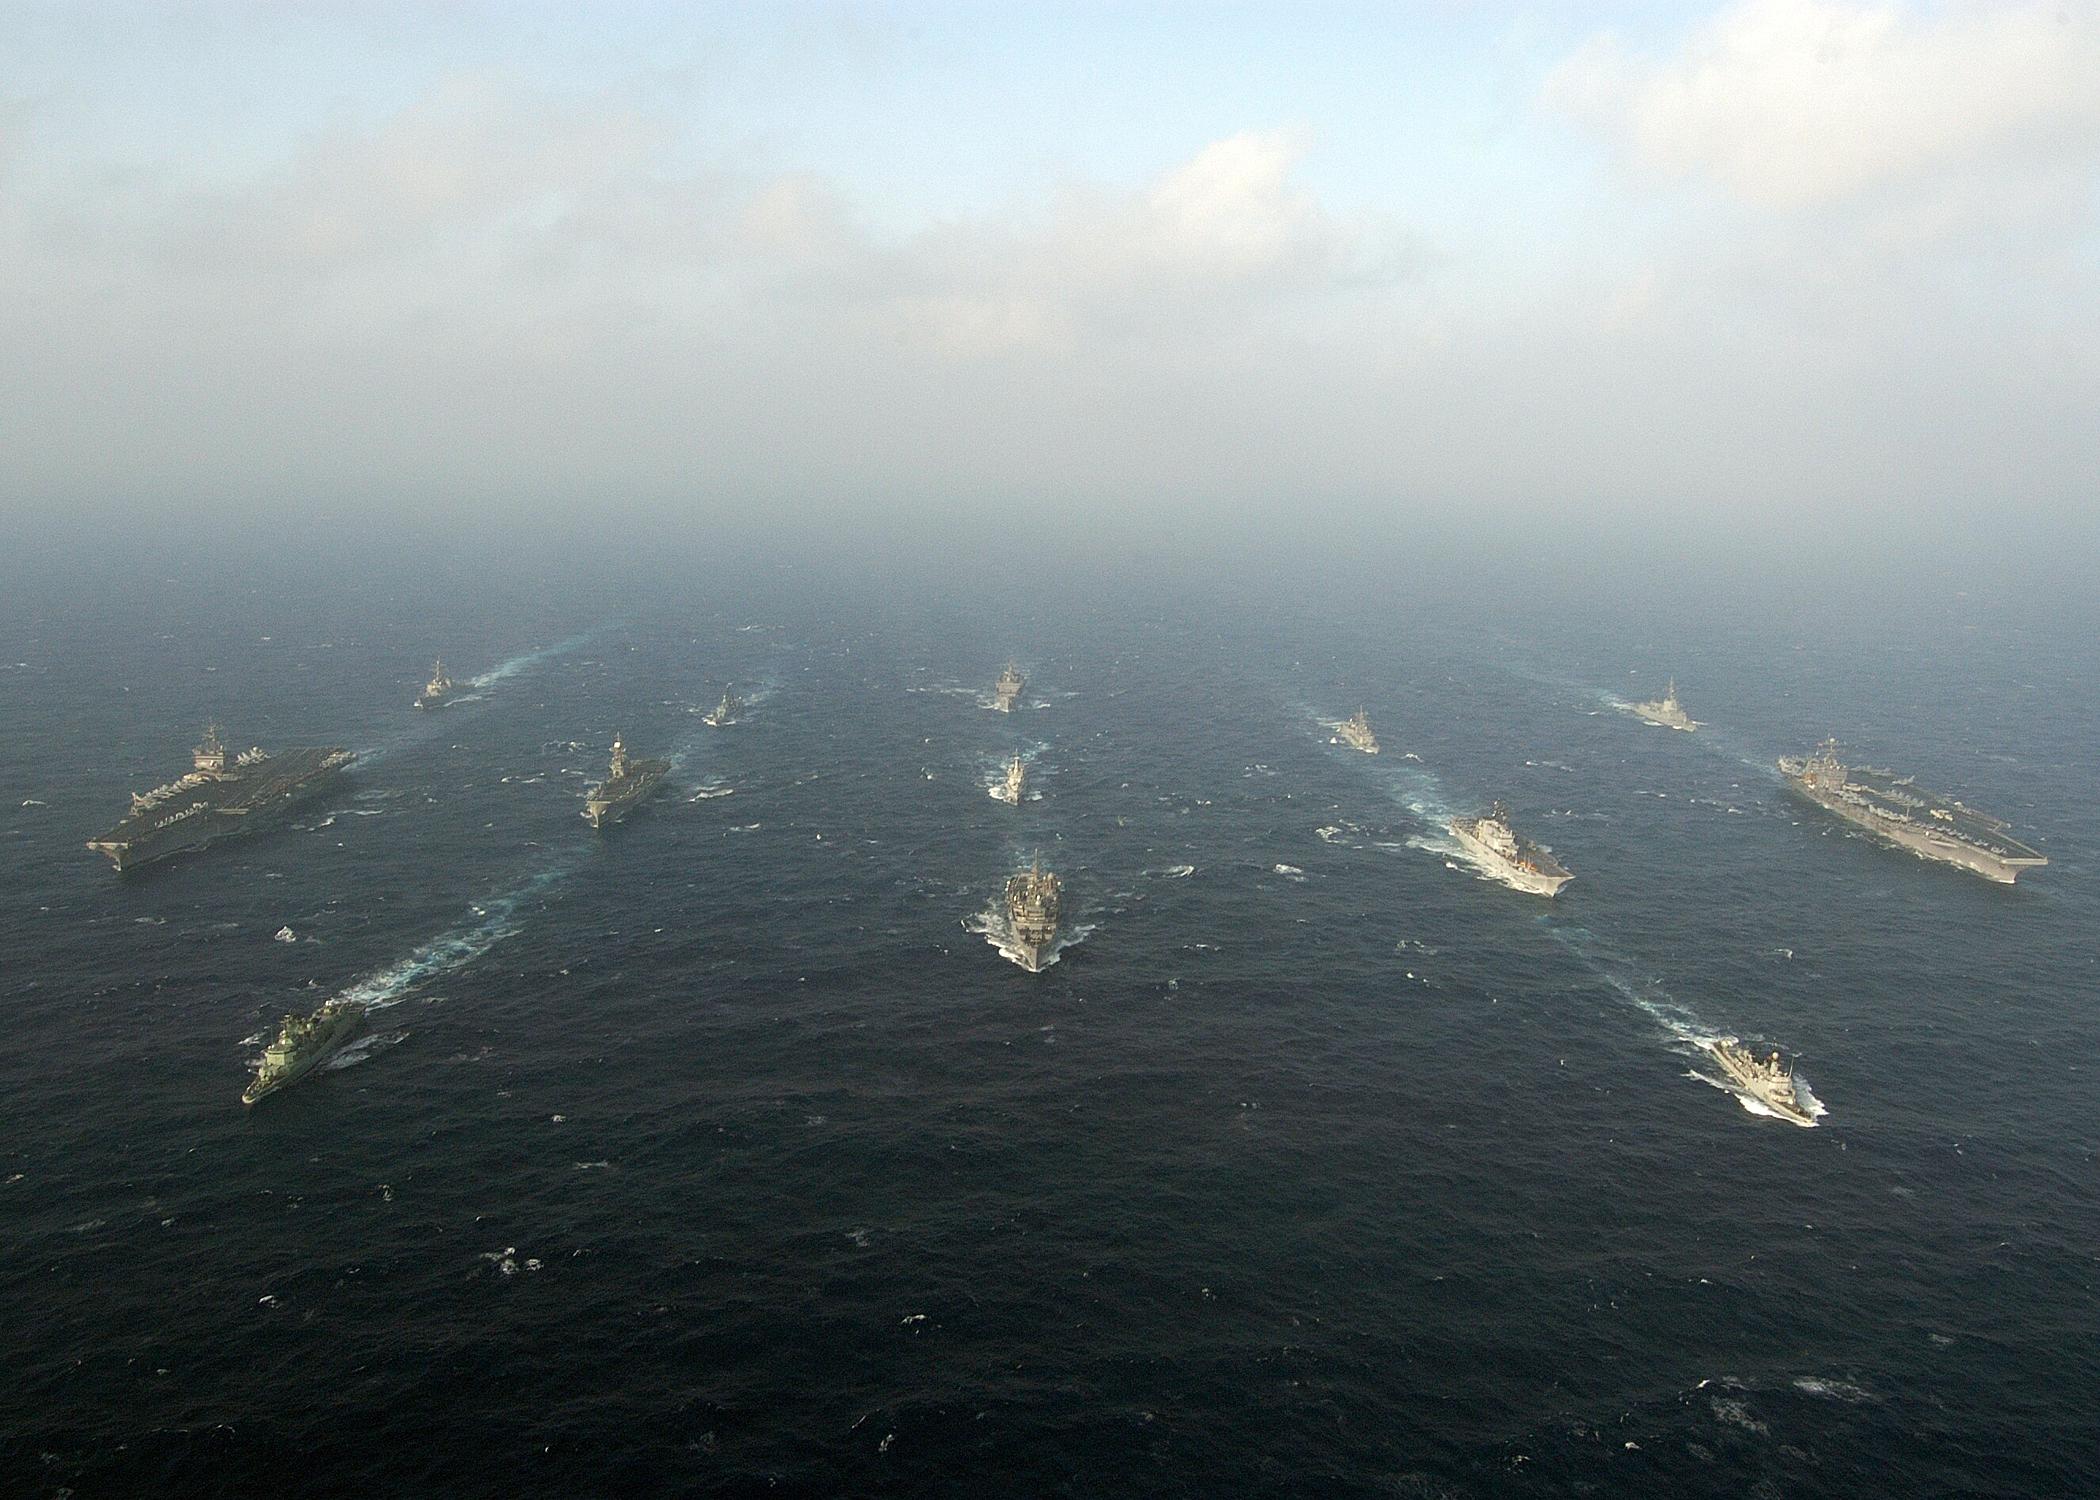 الاسطول السادس الامريكي - فريق الســـــــــهم العربي - US_Navy_040712-N-5405H-101_USS_Enterprise_(CVN_65),_left,_and_USS_Harry_S._Truman_(CVN_75),_right,_steam_through_the_waters_of_the_Atlantic_Ocean_in_formation_with_other_US_Navy_ships_and_multi-national_warships_as_part_of_Maje